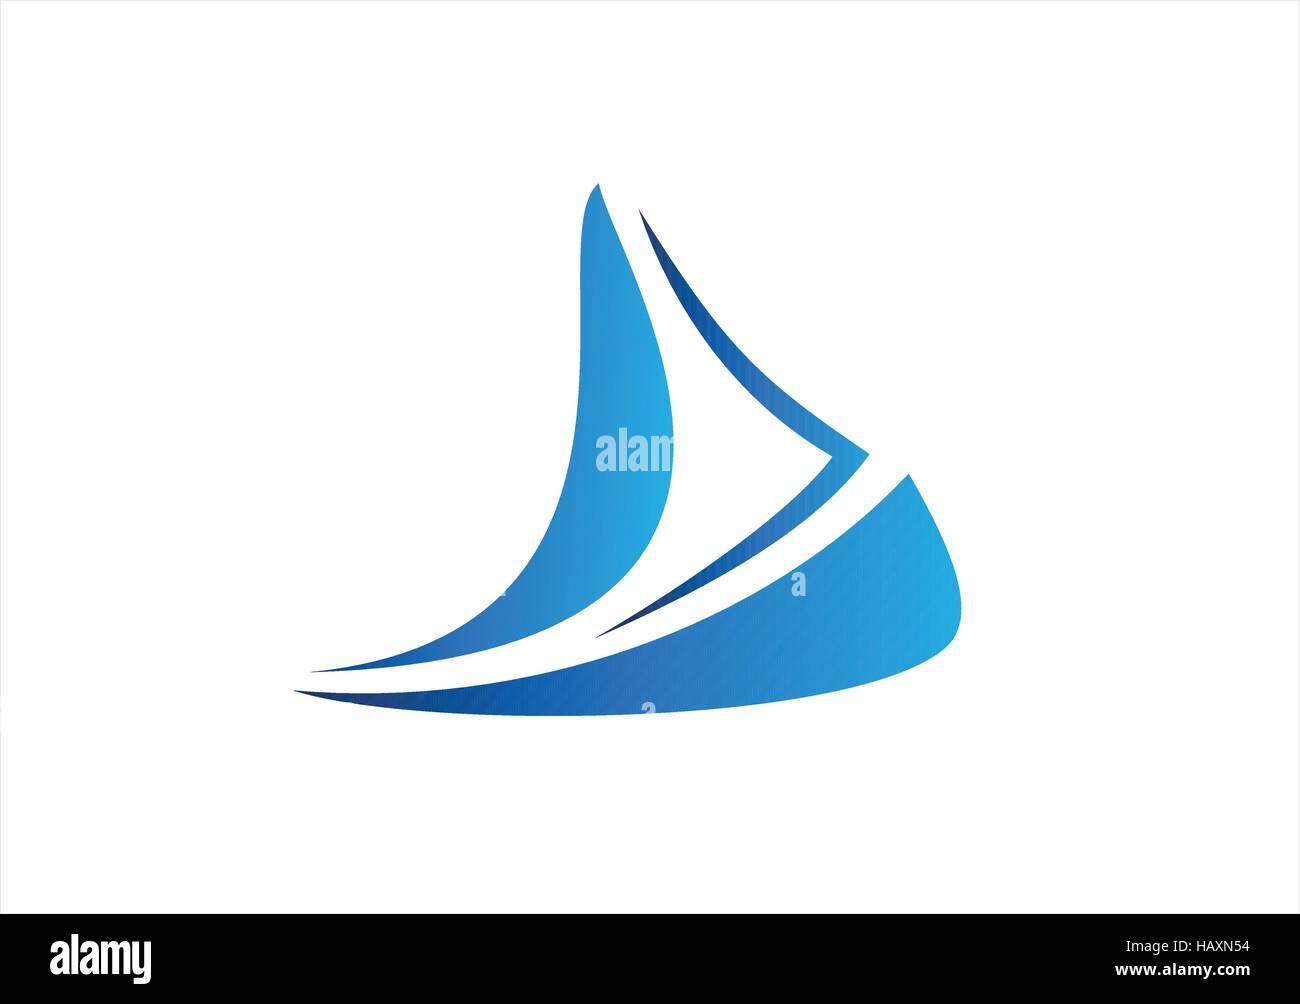 sailboat logo, business boat cruise ocean vector icon, sea wave travel boating design symbol, blue ship boat logo - Stock Image